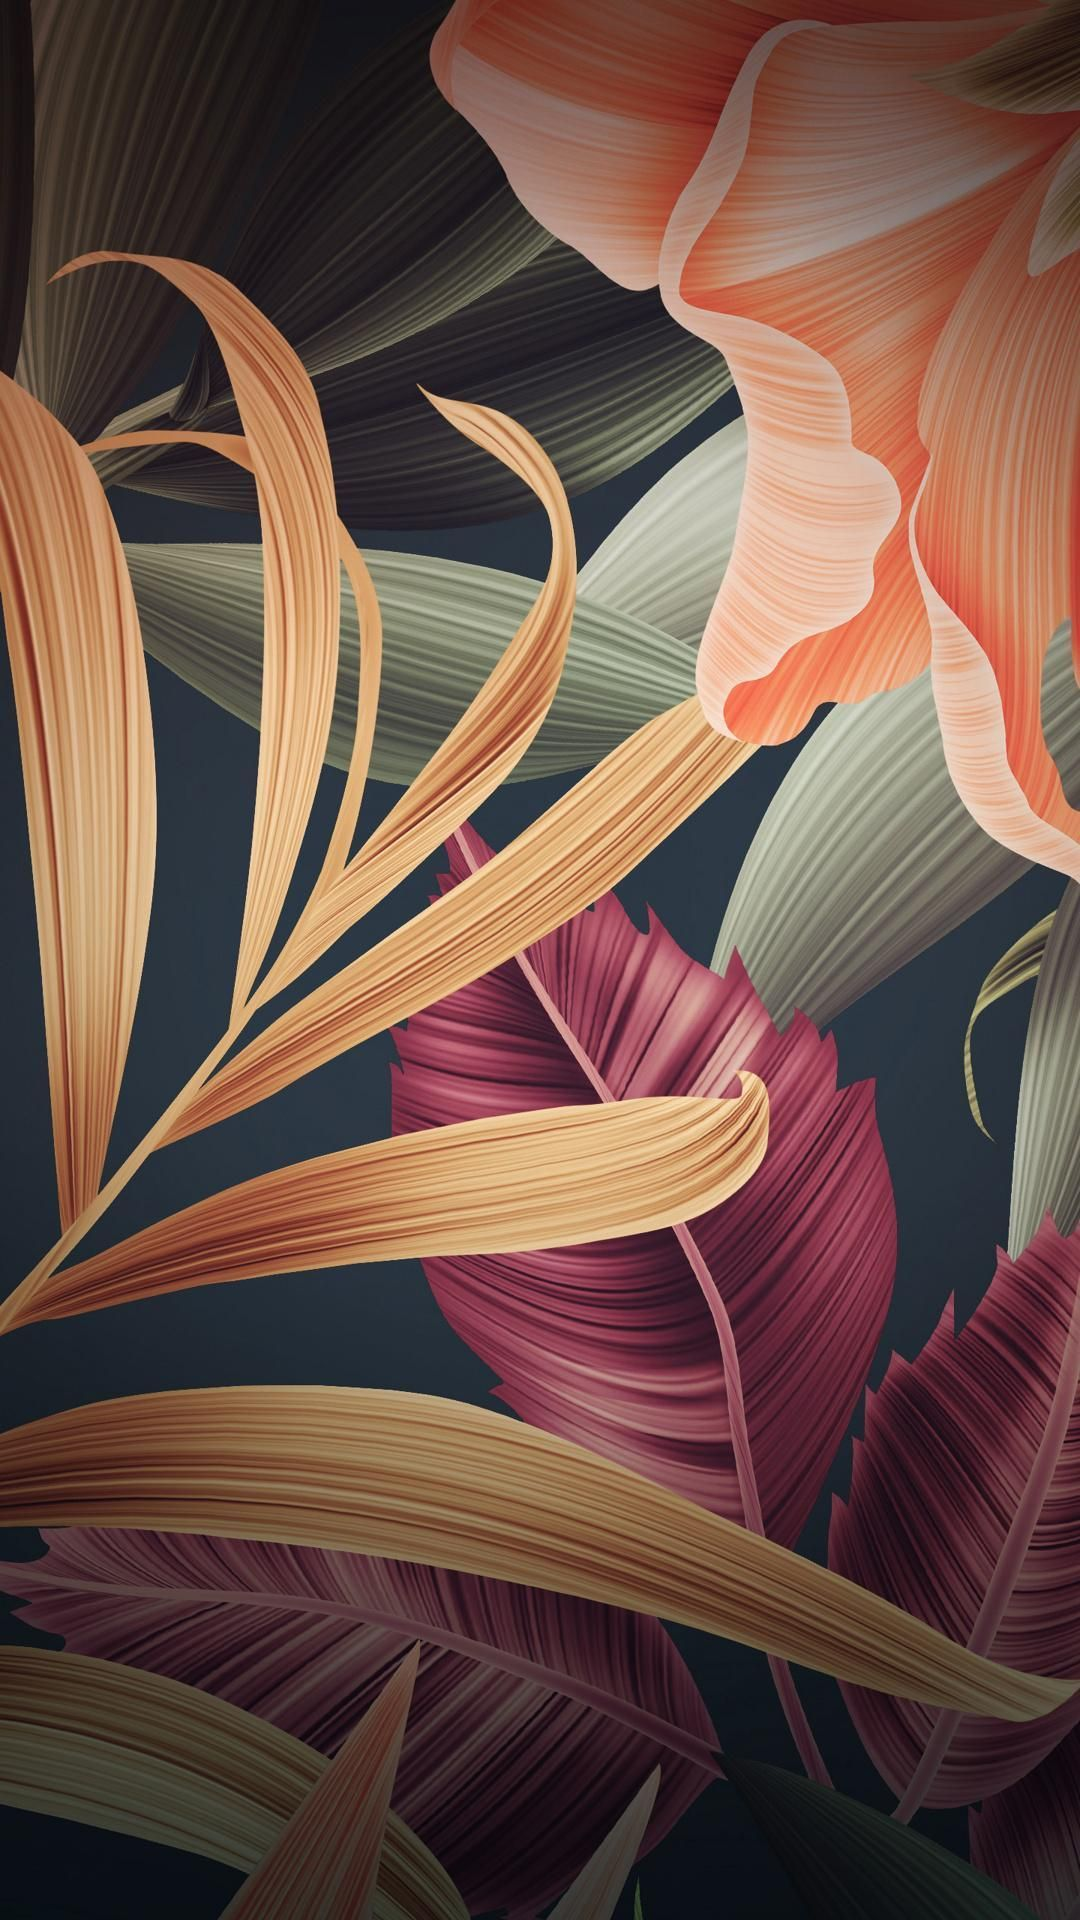 #huaw #mate #eiHUAW EI MATE 10 | Huawei wallpapers, Leaf wallpaper, Po